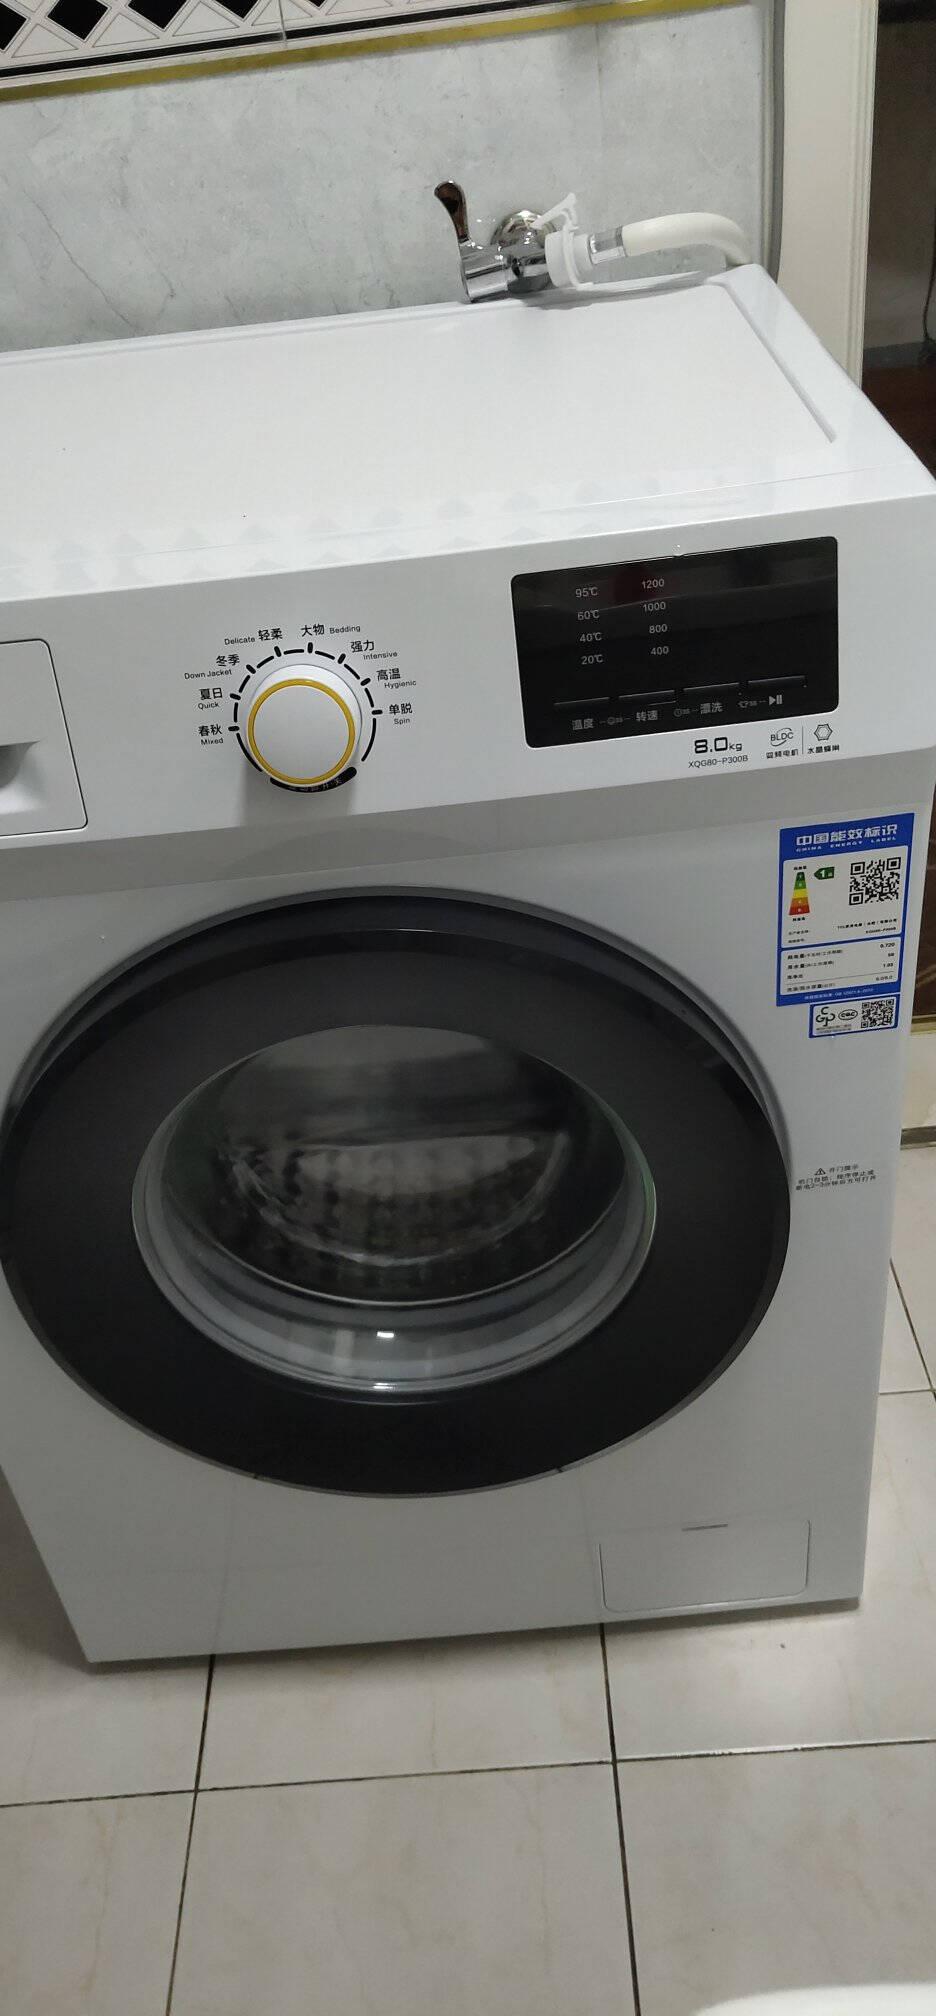 TCLXQG80-P300B变频滚筒8公斤全自动洗衣机家用低音小9kg大7一级能效低音芭蕾白